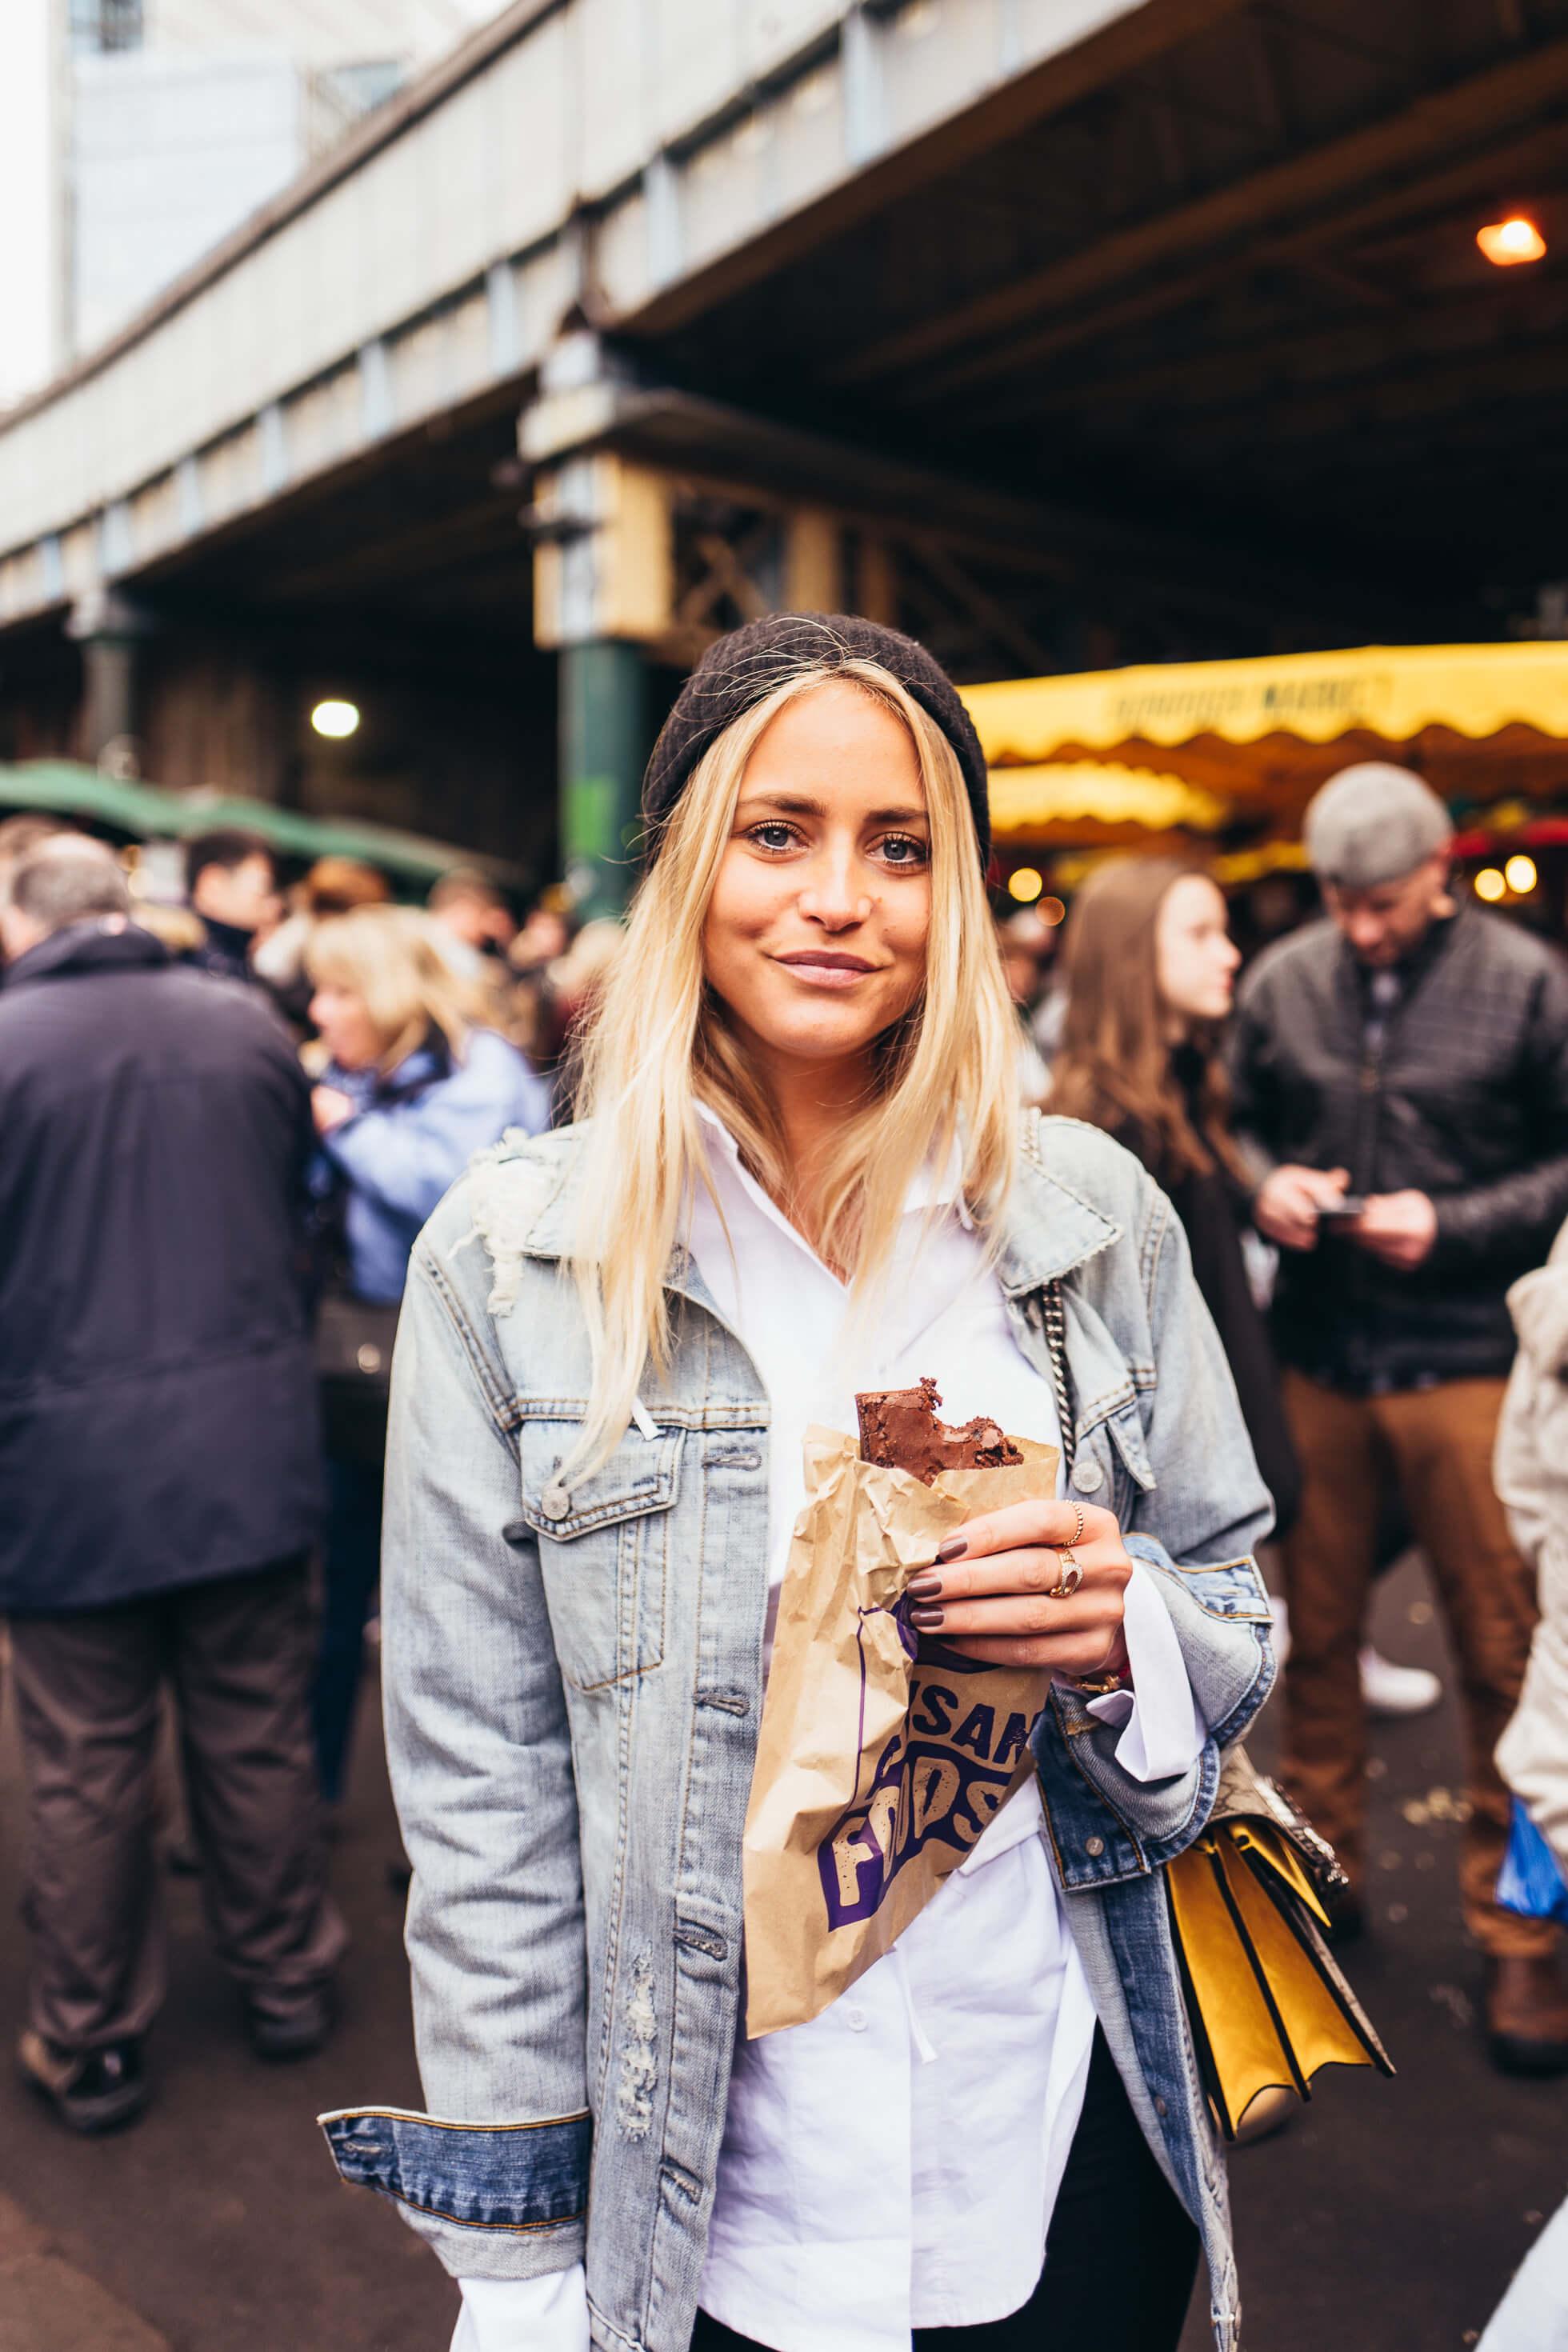 janni-deler-bourough-market-londonl1160292